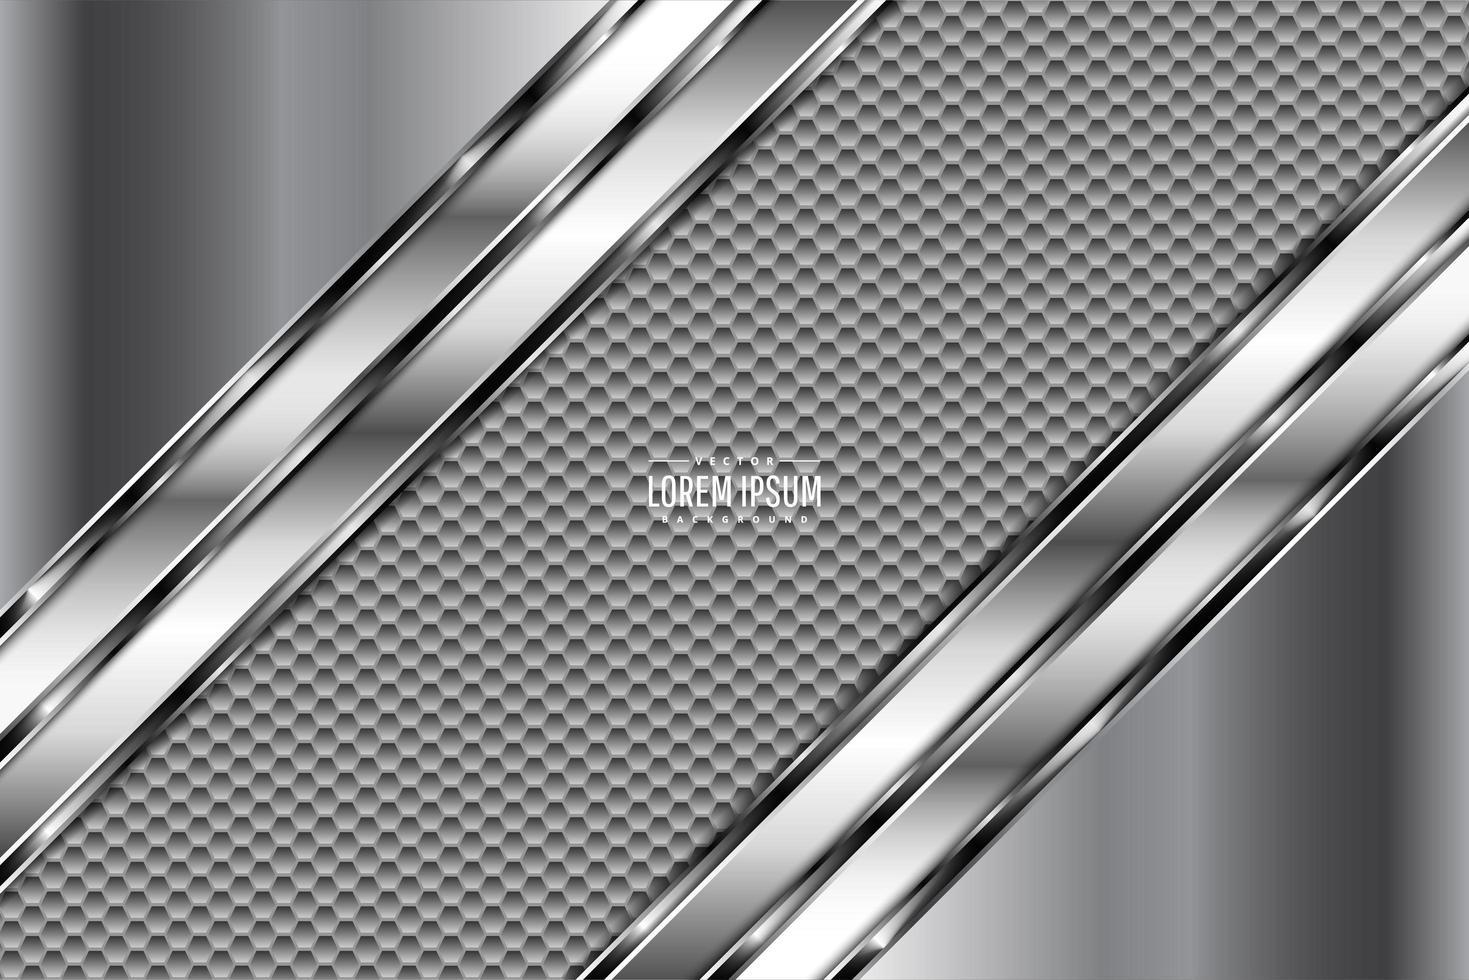 Fondo de metal gris con textura de fibra de carbono vector